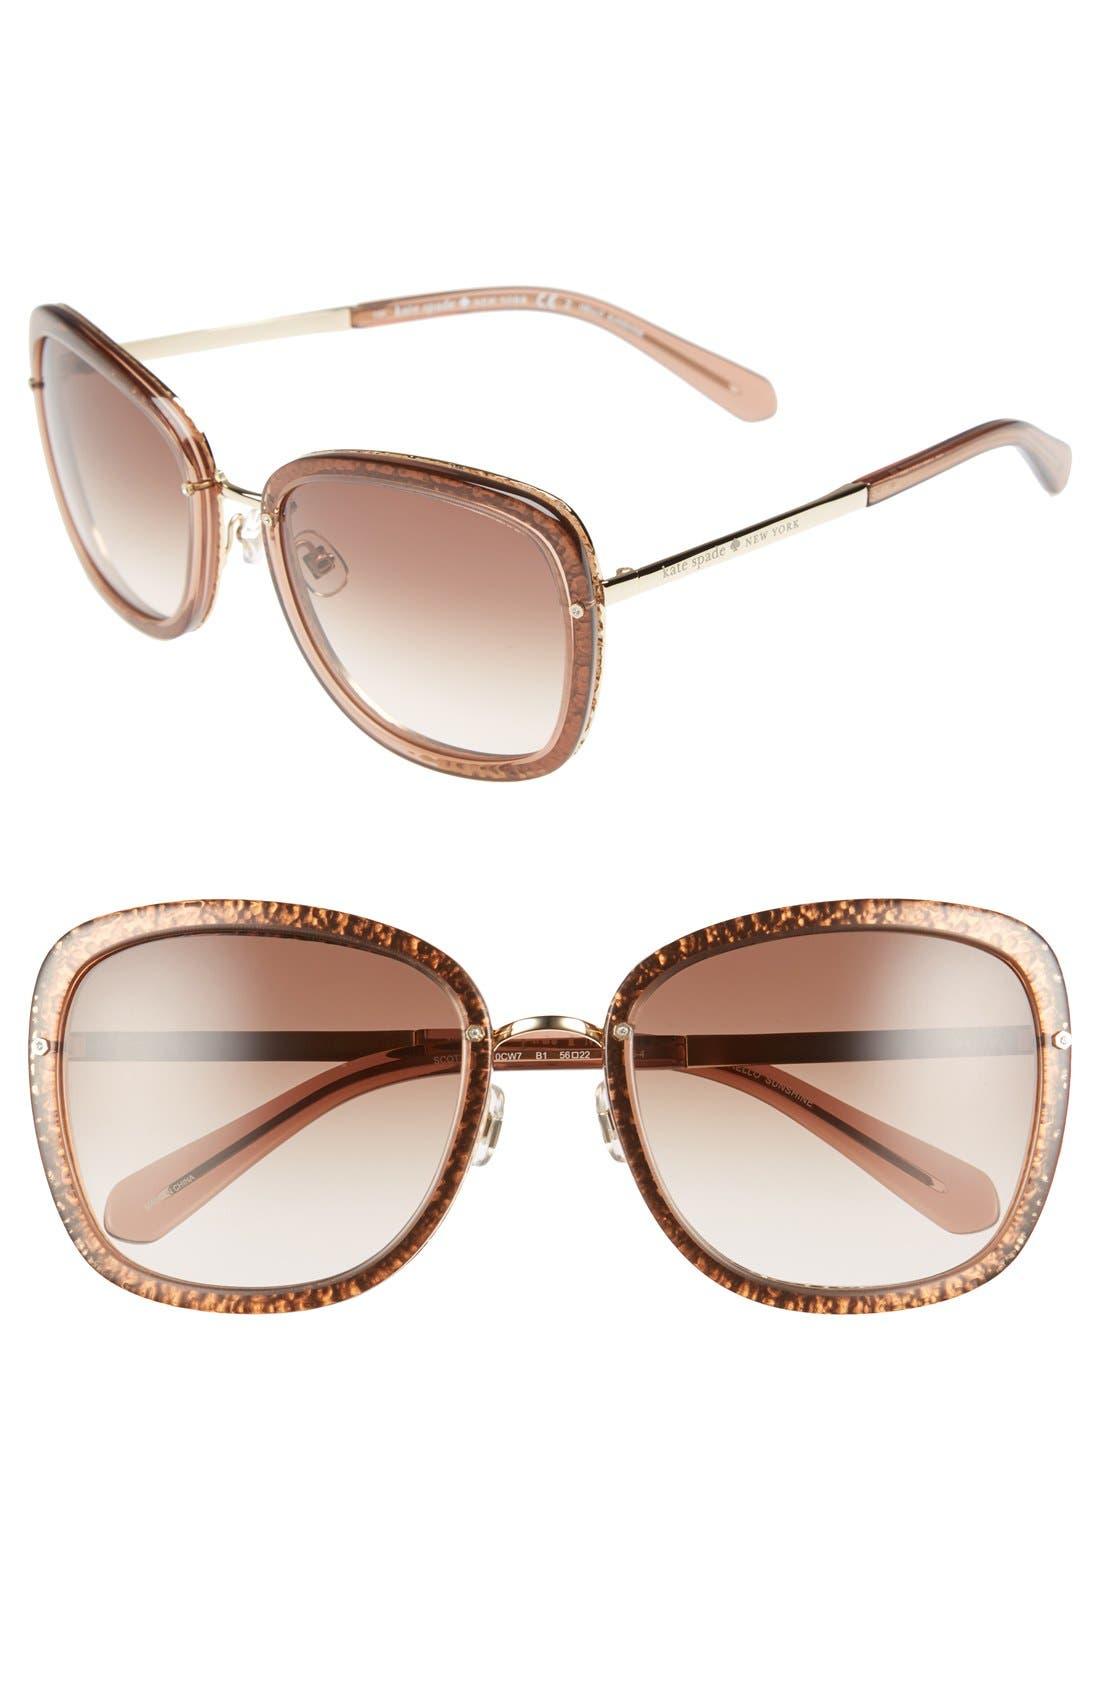 KATE SPADE NEW YORK 'scottie' 56mm retro sunglasses, Main, color, 200